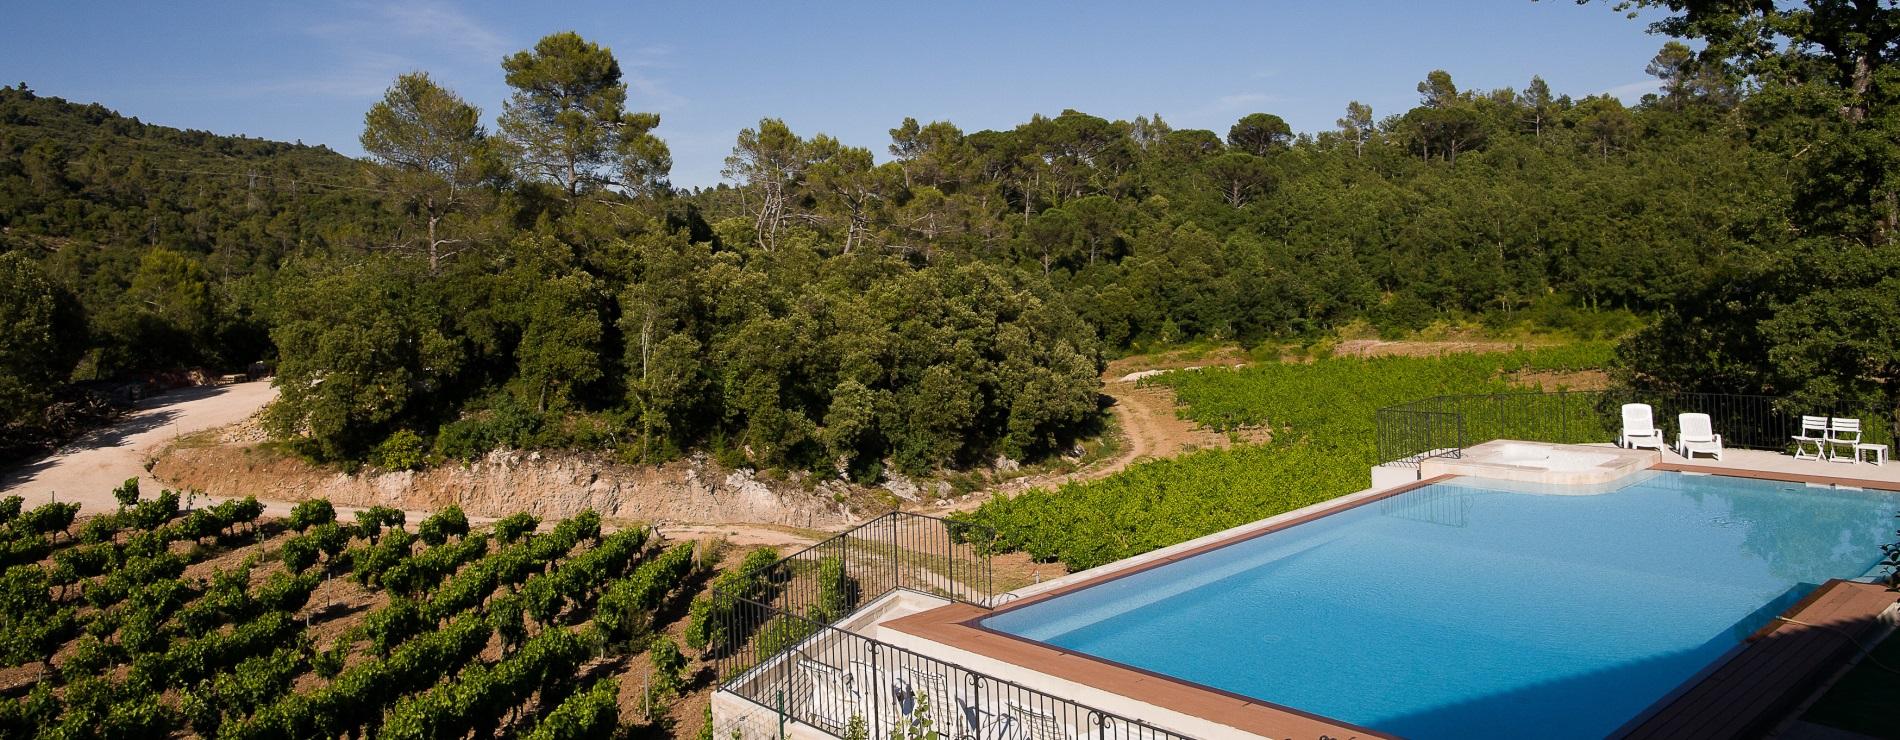 jacuzzi-piscine-provence